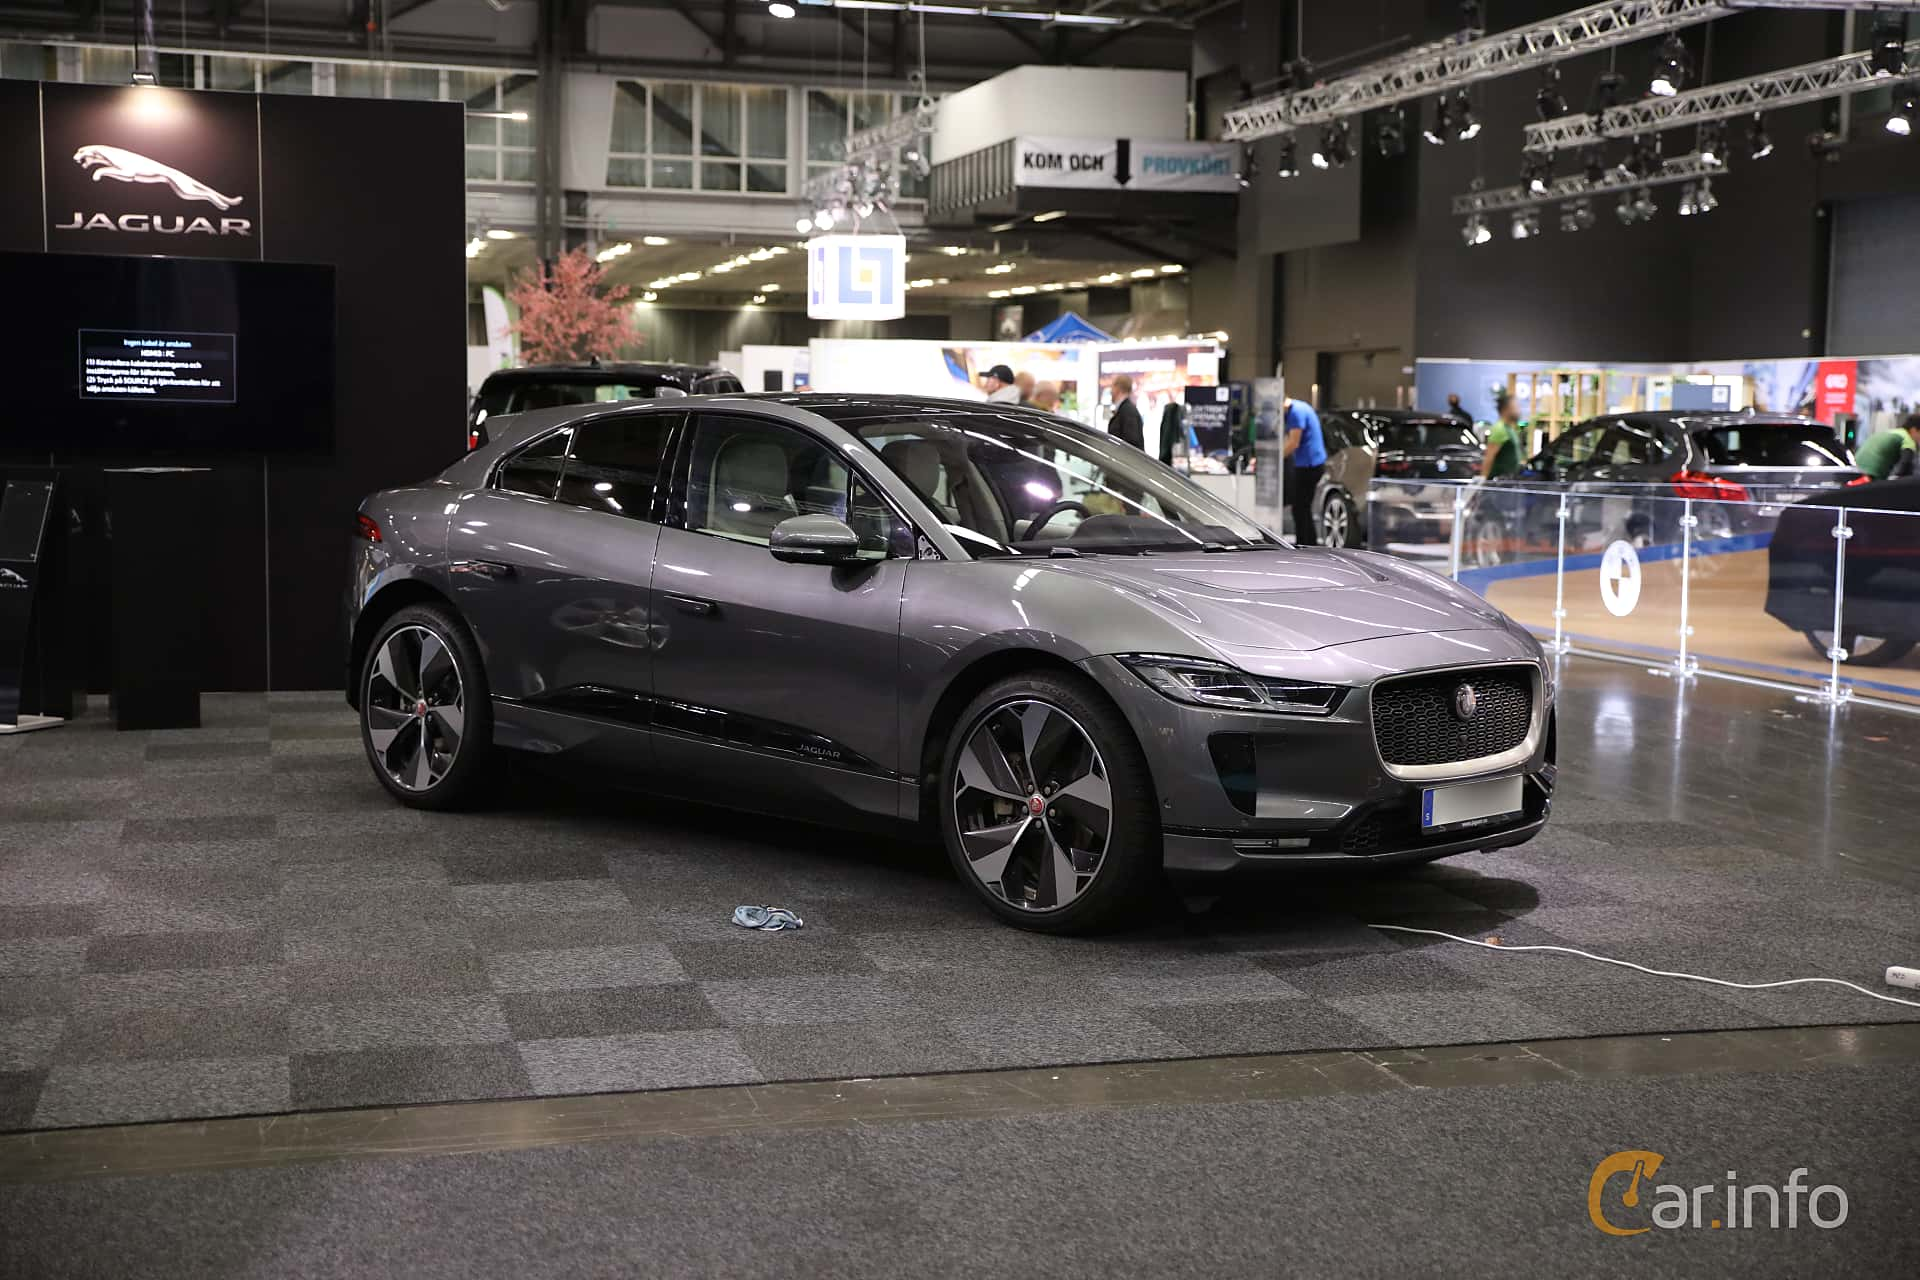 Jaguar I-Pace EV400 AWD  Single Speed, 400hp, 2019 at eCar Expo Göteborg 2018